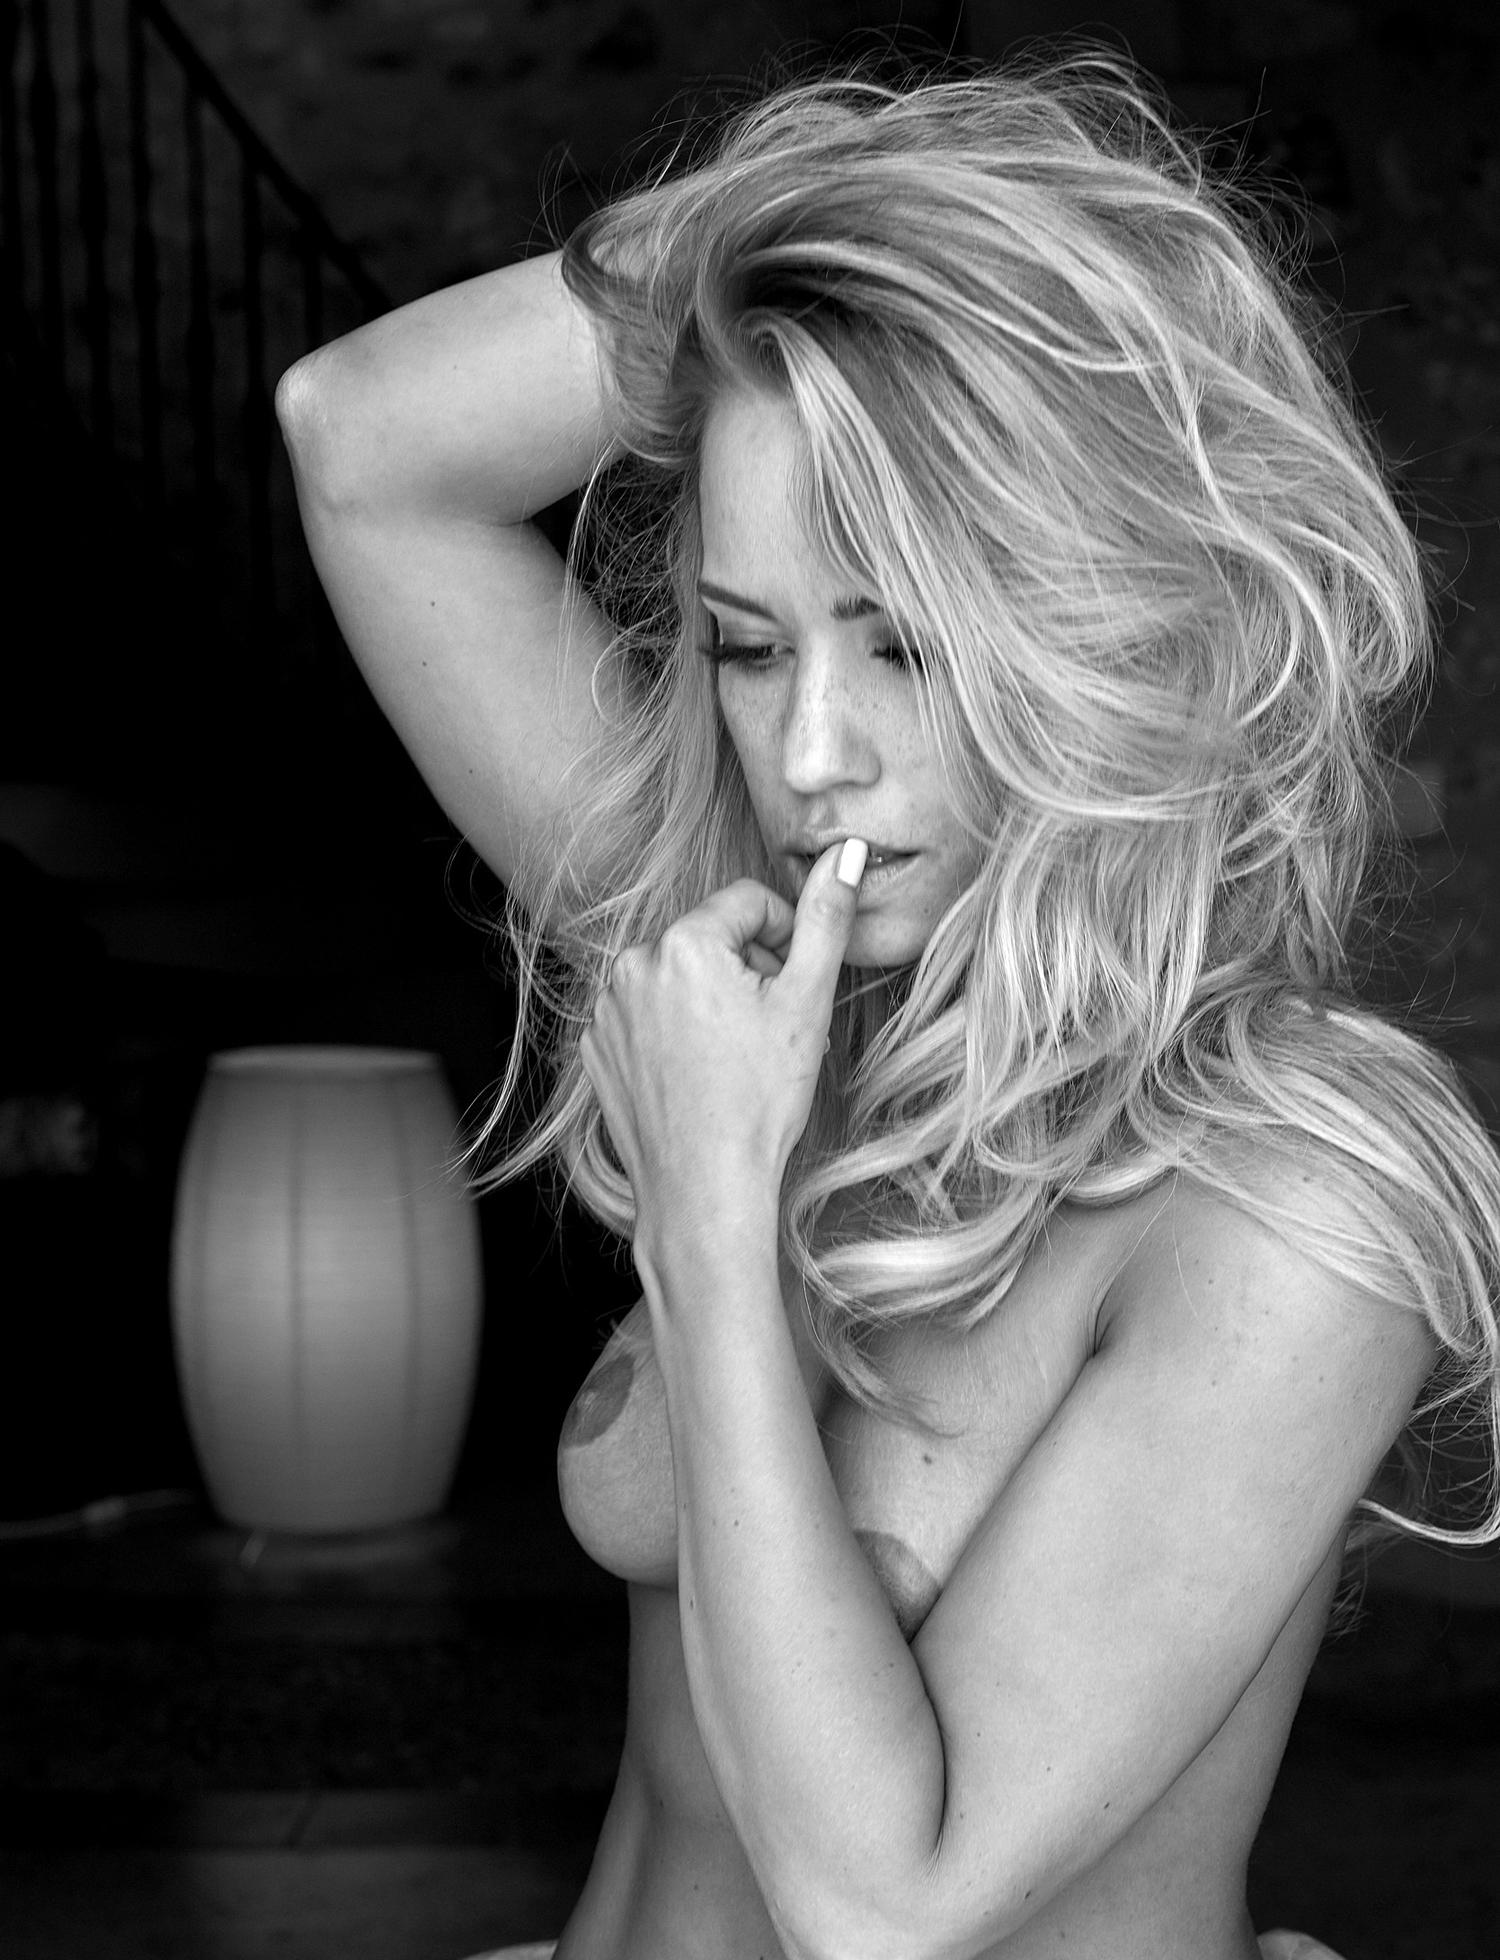 Лара-Изабель Рентинк голая. Фото - 38